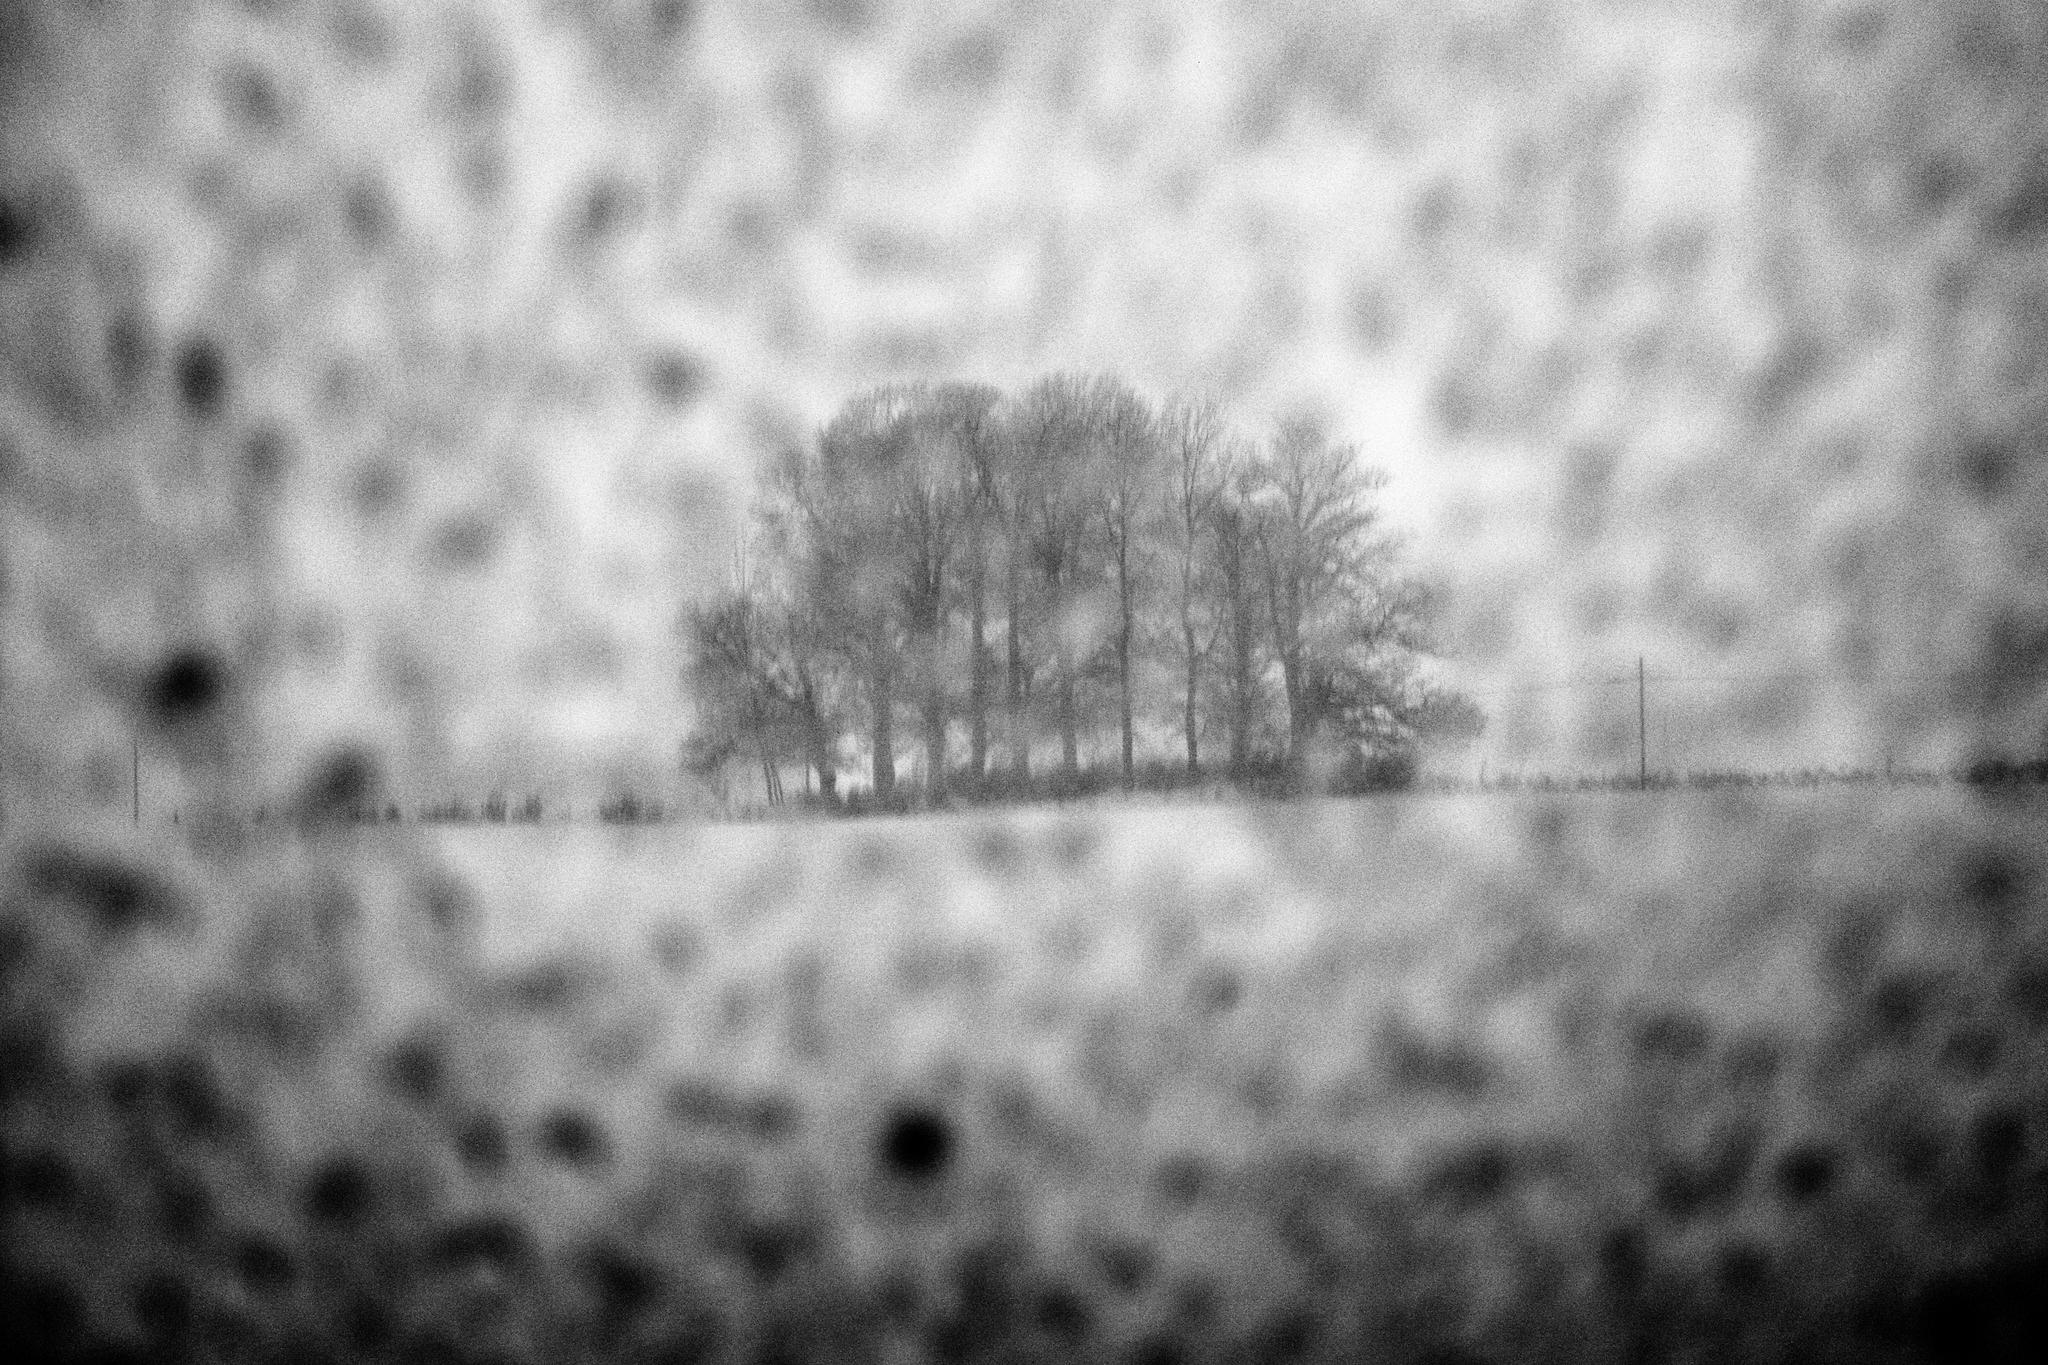 Marco Ascrizzi: Nevicata